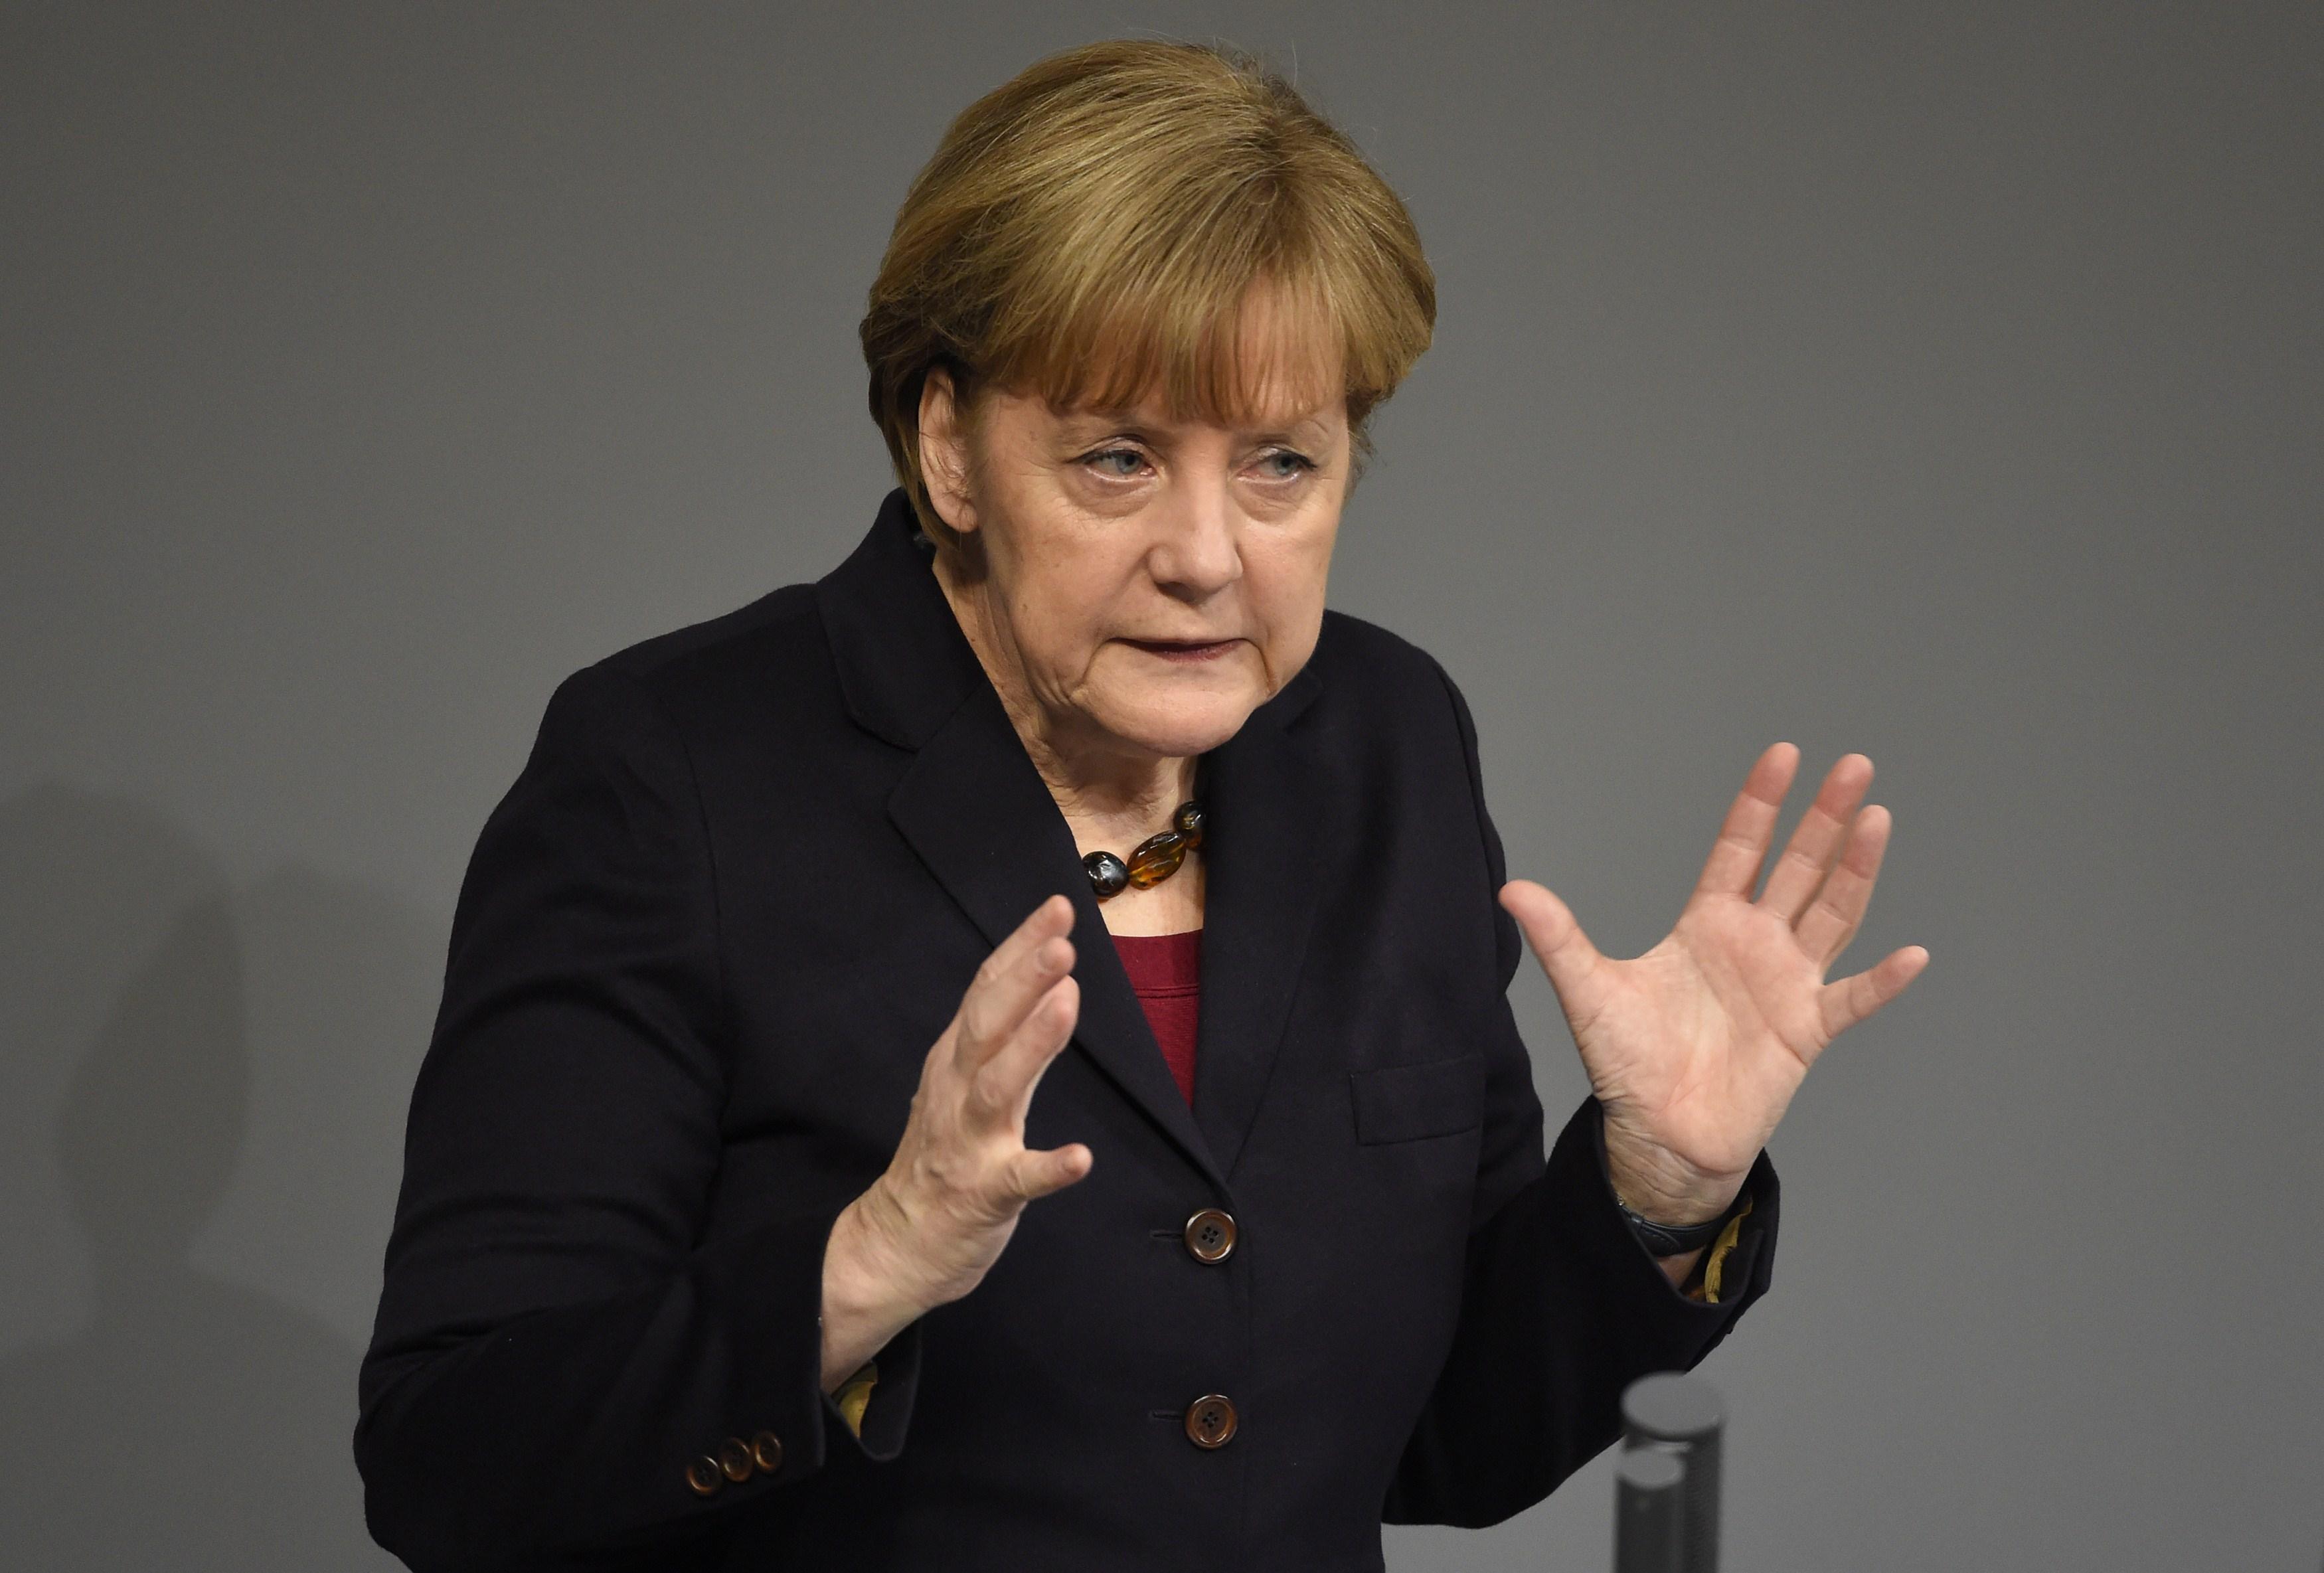 GREXIT 2015: Prima declaratie a Angelei Merkel, dupa ce s-a speculat ca Grecia iese din zona euro. Ce se va intampla in UE